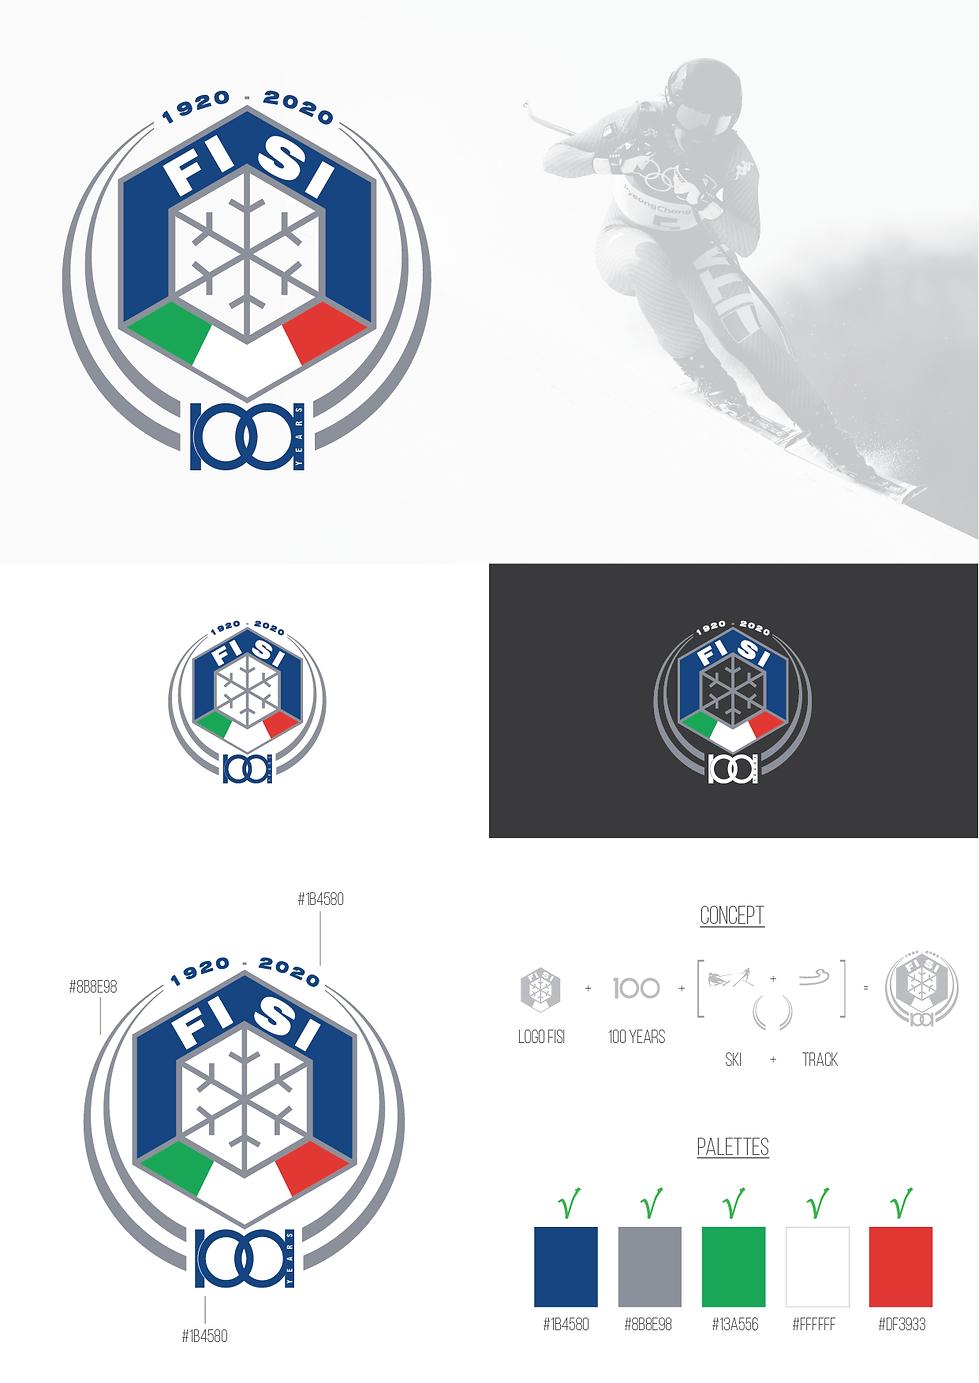 Contest Logo Centenario FISI Lorenzo Dalmasso